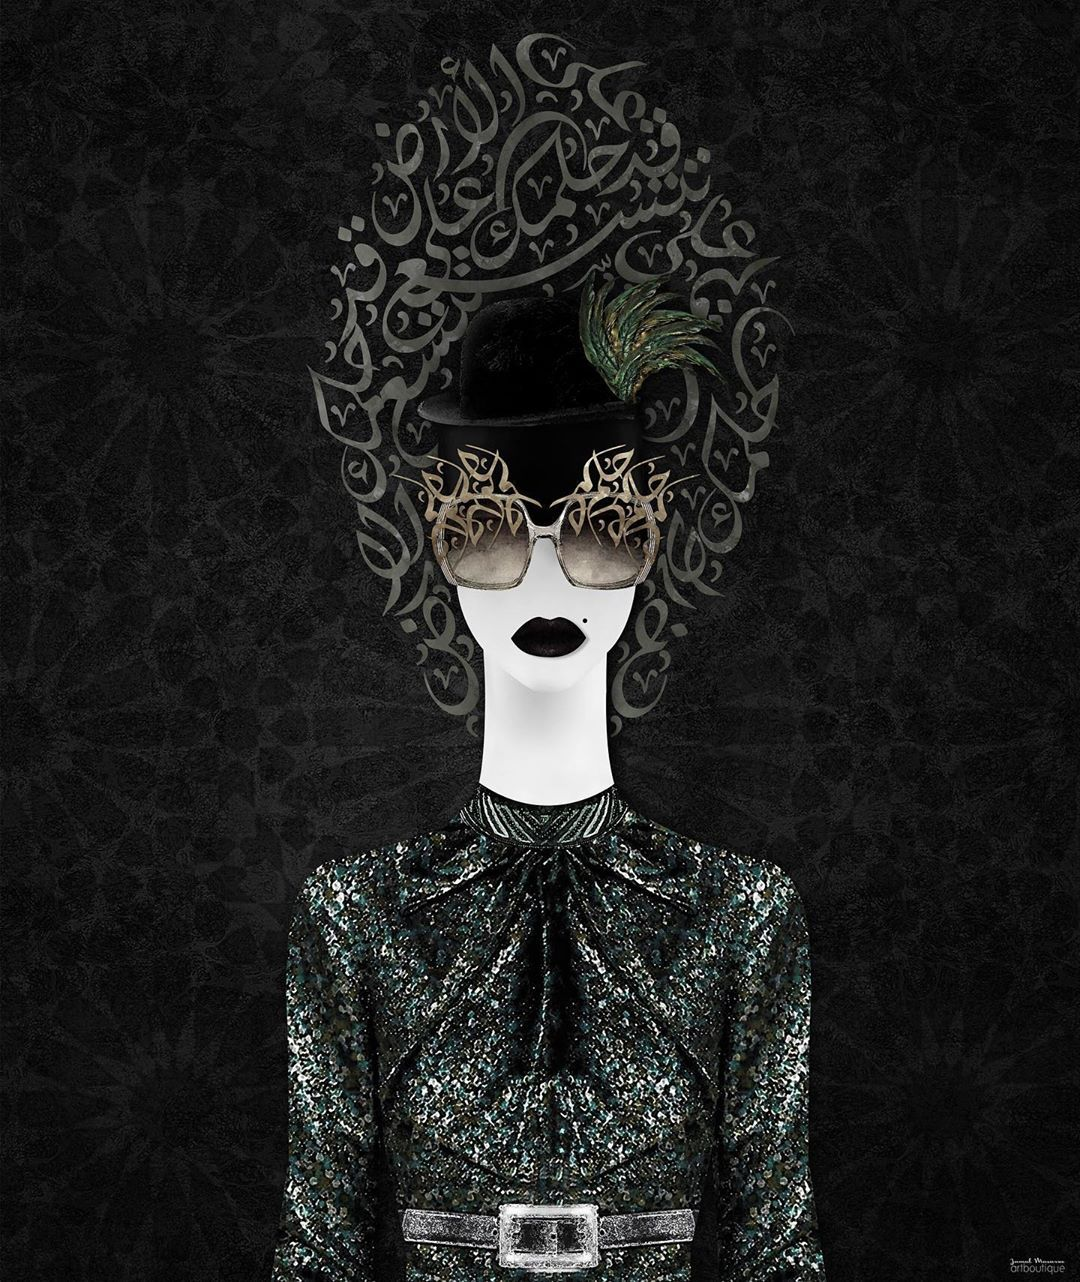 Jamal Masarwa On Instagram New Artwork عمل جديد Yves Saint Laurent إيف سان لوران Dream حلم Photobook Design Photo Book Book Design